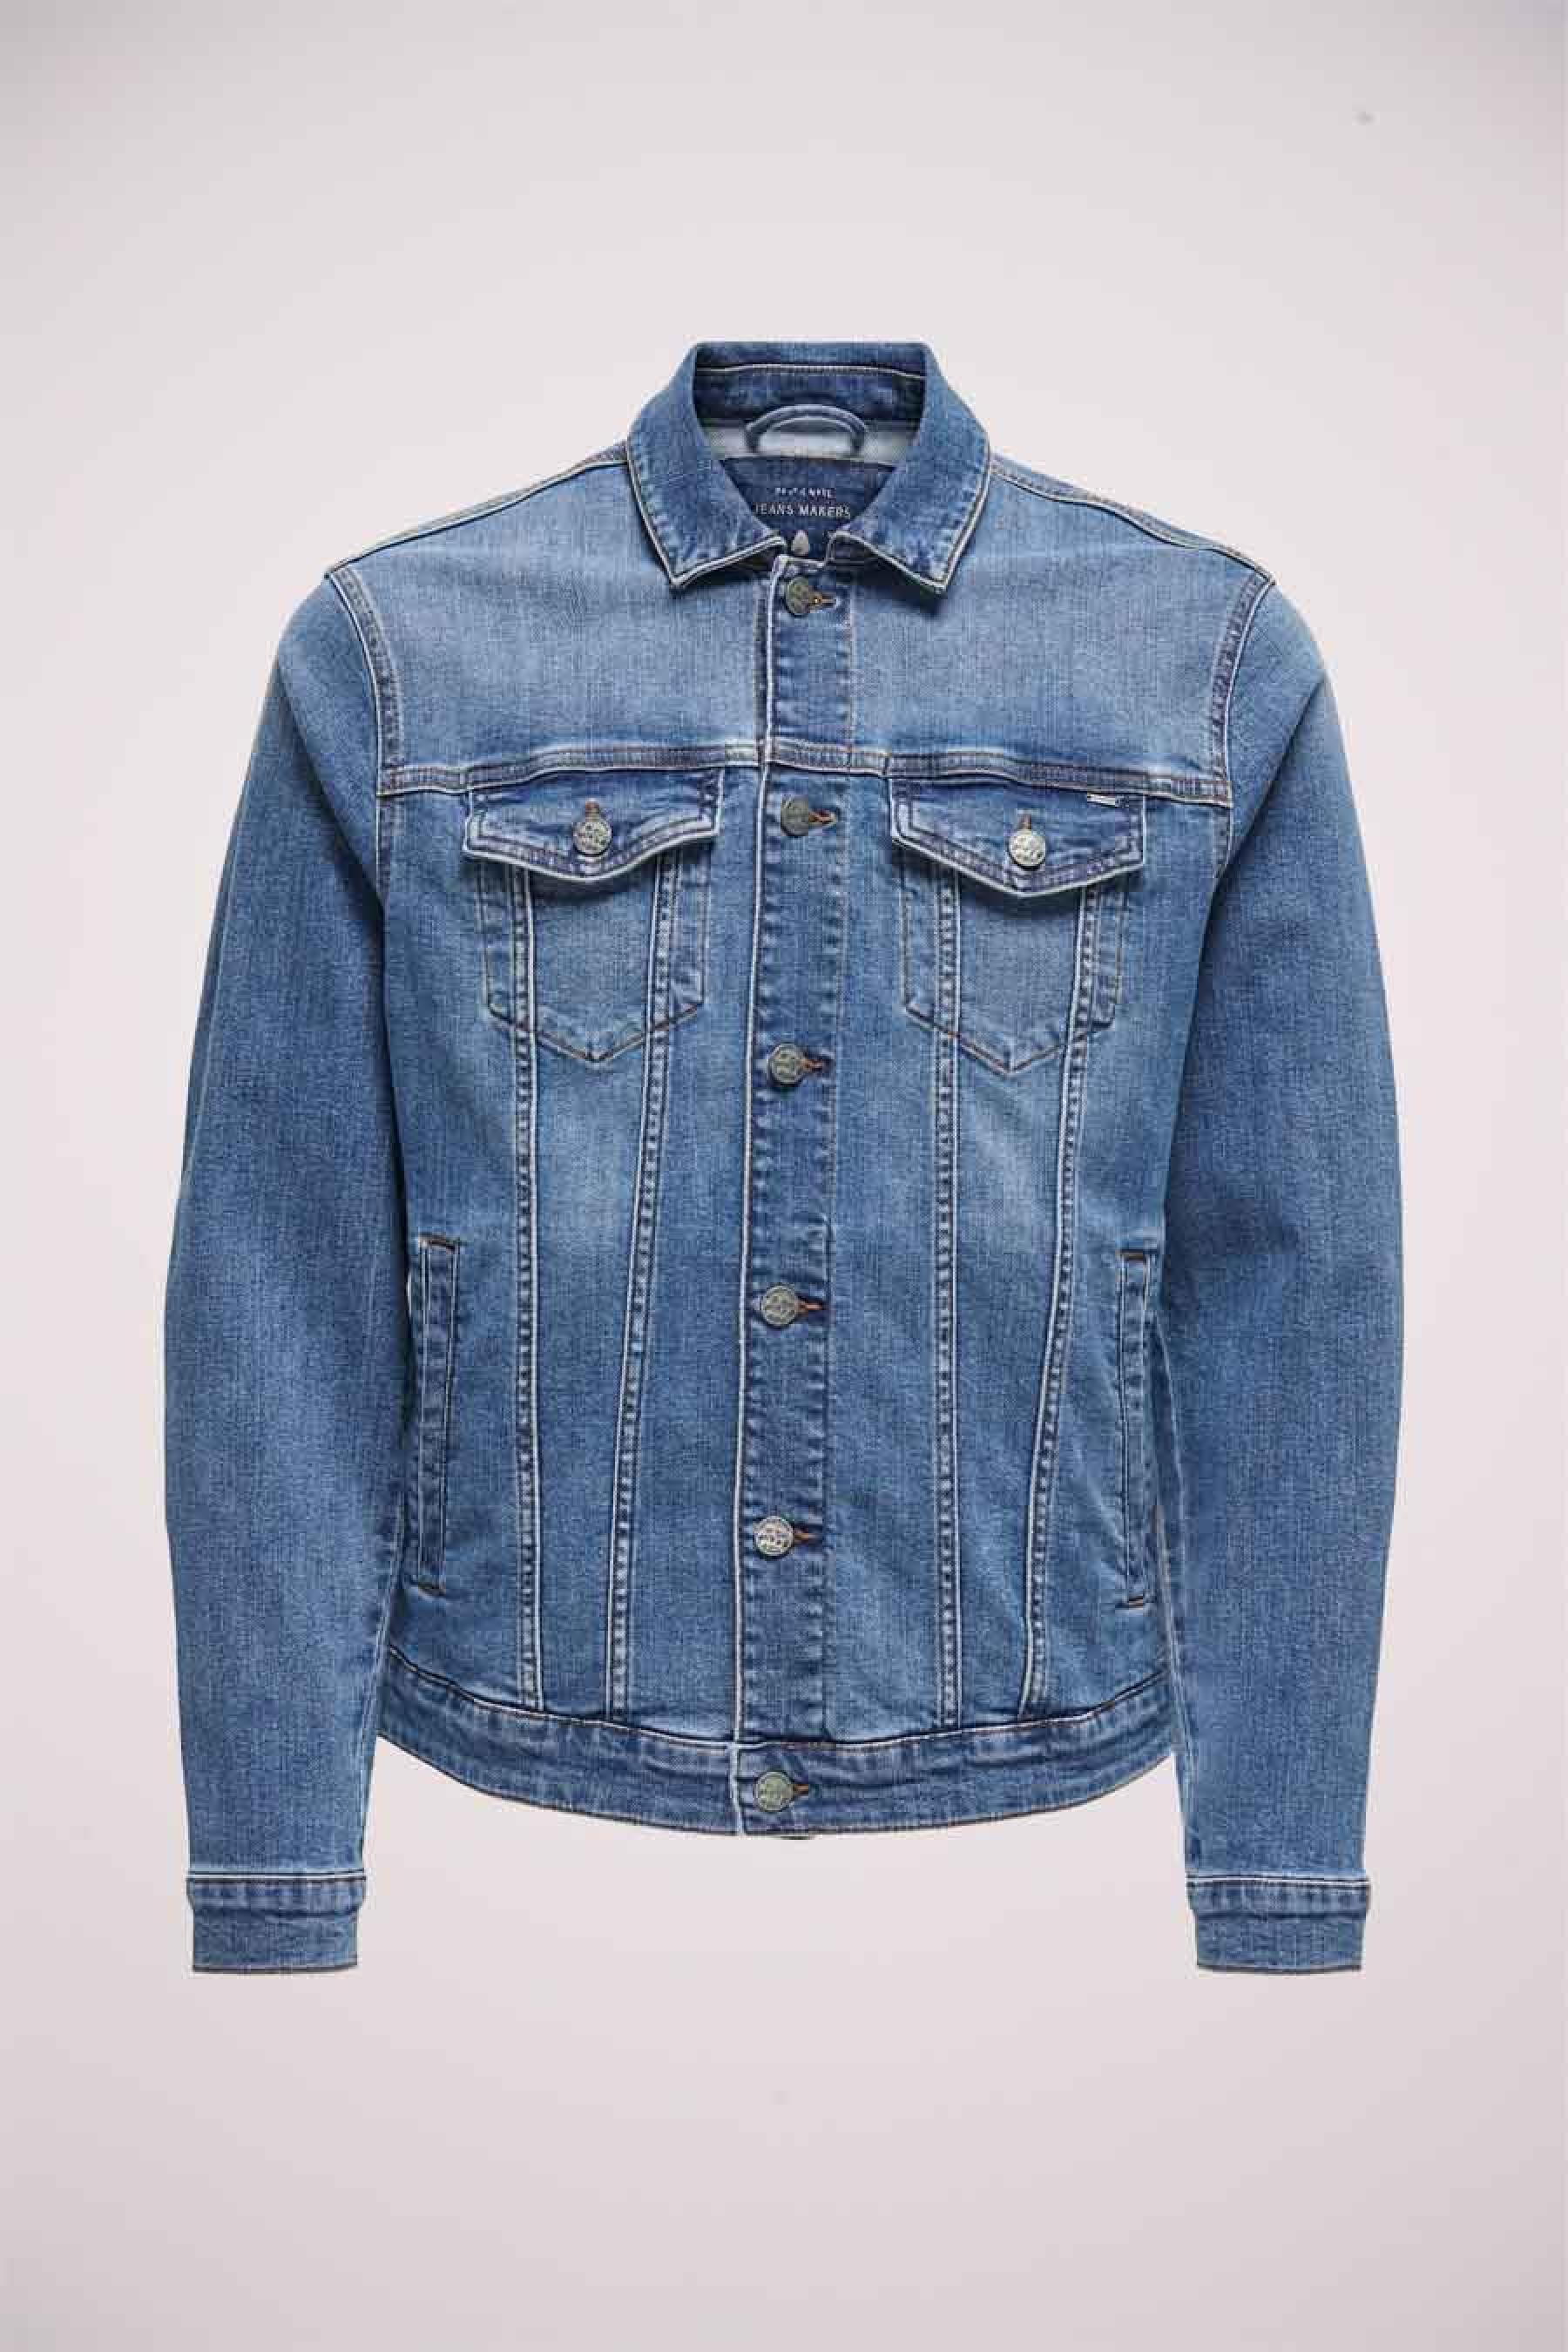 ONLY & SONS Jas jeans, Denim, Heren, Maat: L/M/S/XL